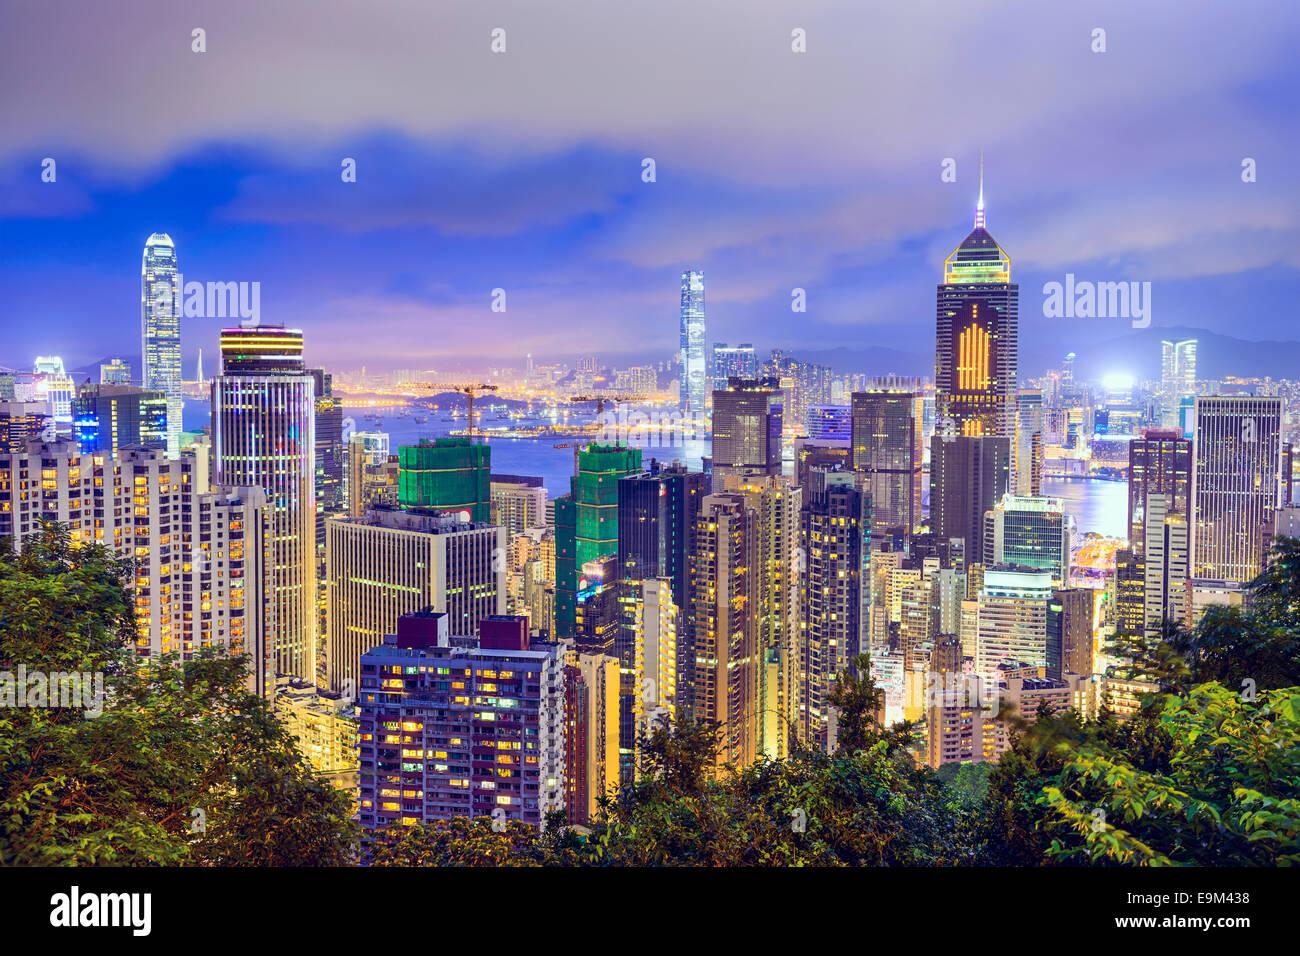 Hong Kong, China Skyline. - Stock Image